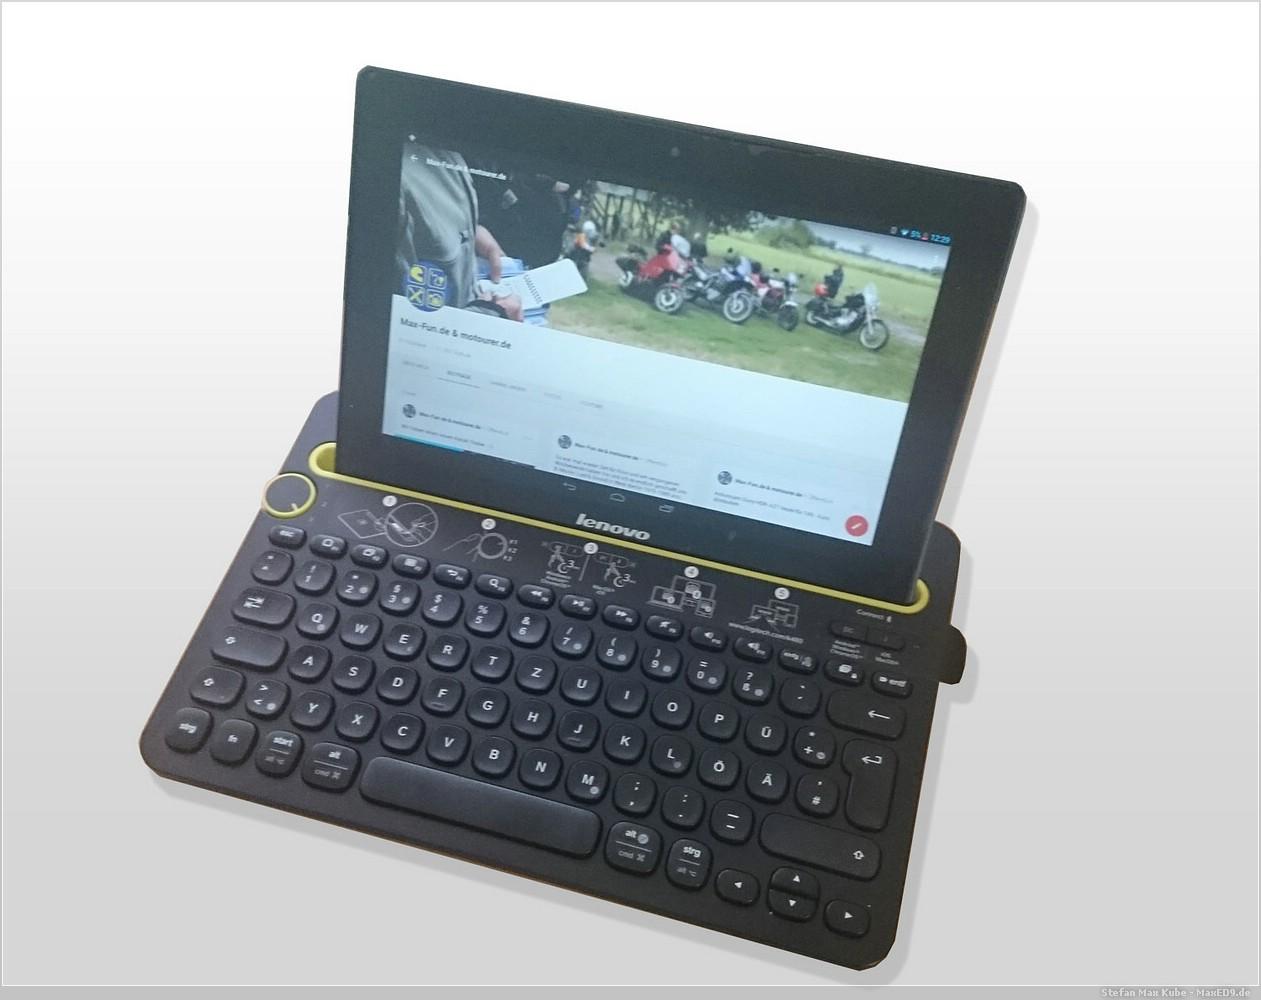 Lenovo IdeaPad S6000 und Logitech K480